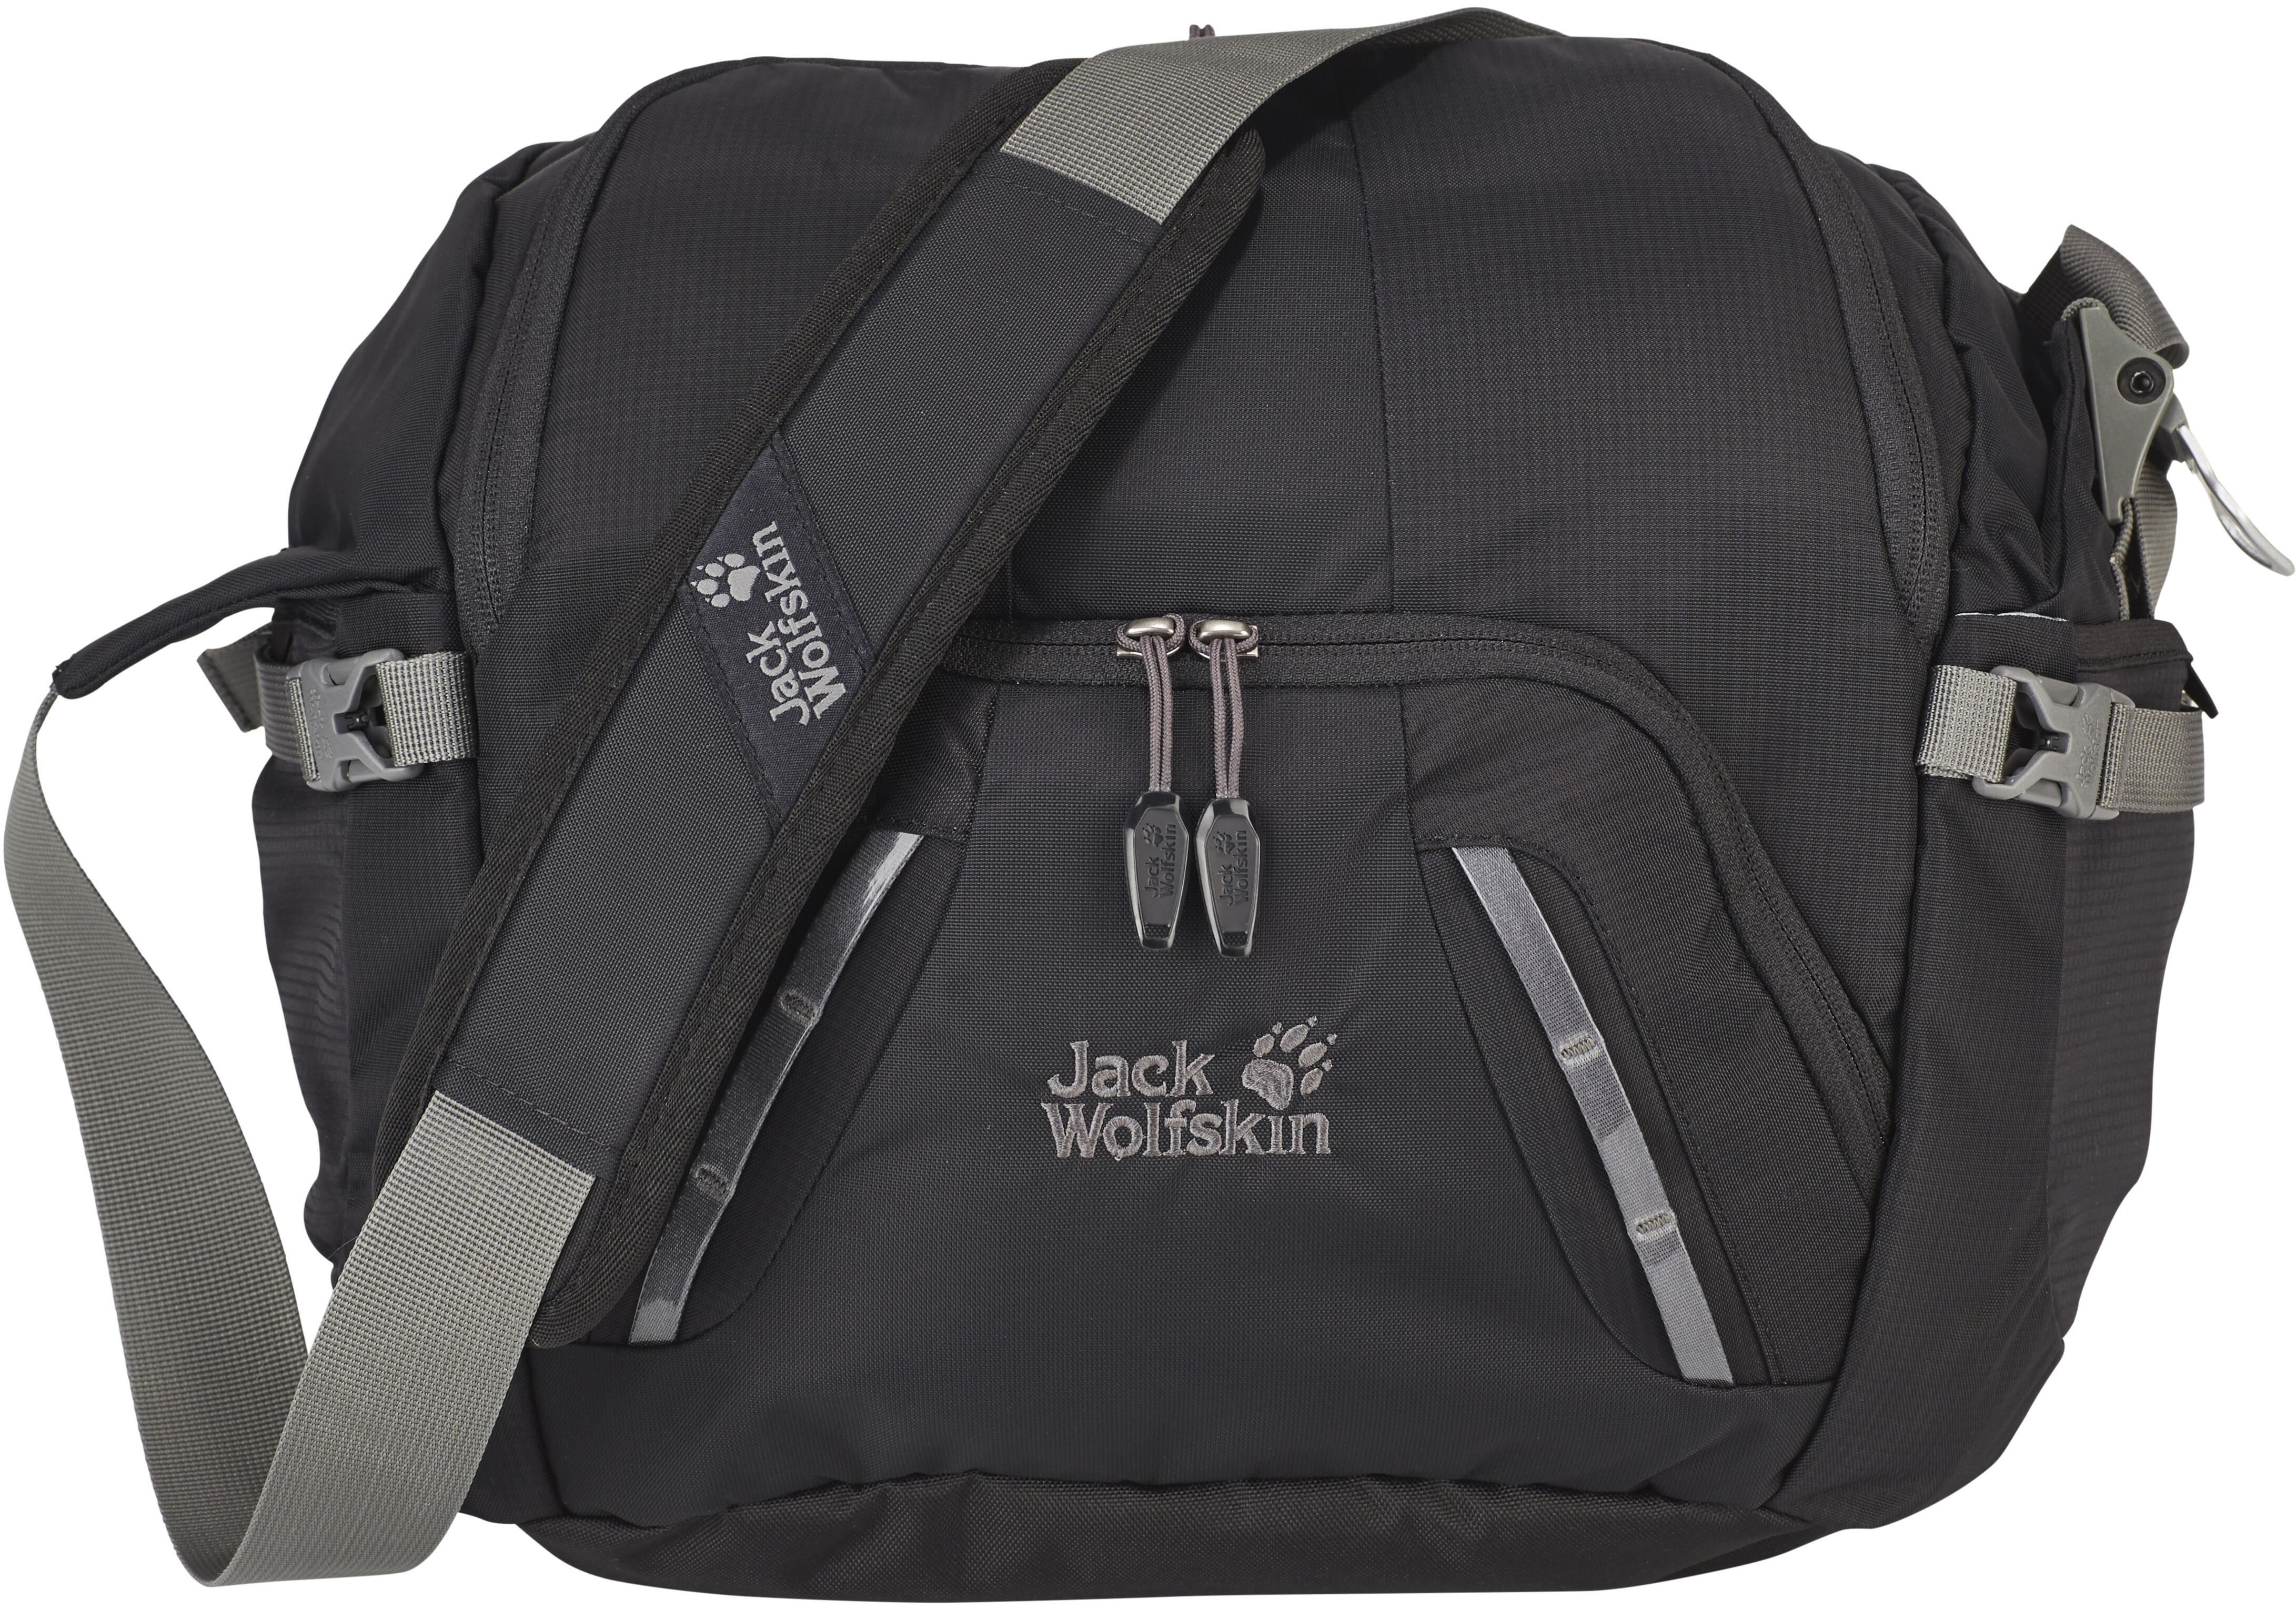 Klettergurt Mammut Focus Test : Jack wolfskin acs photo bag black campz.de